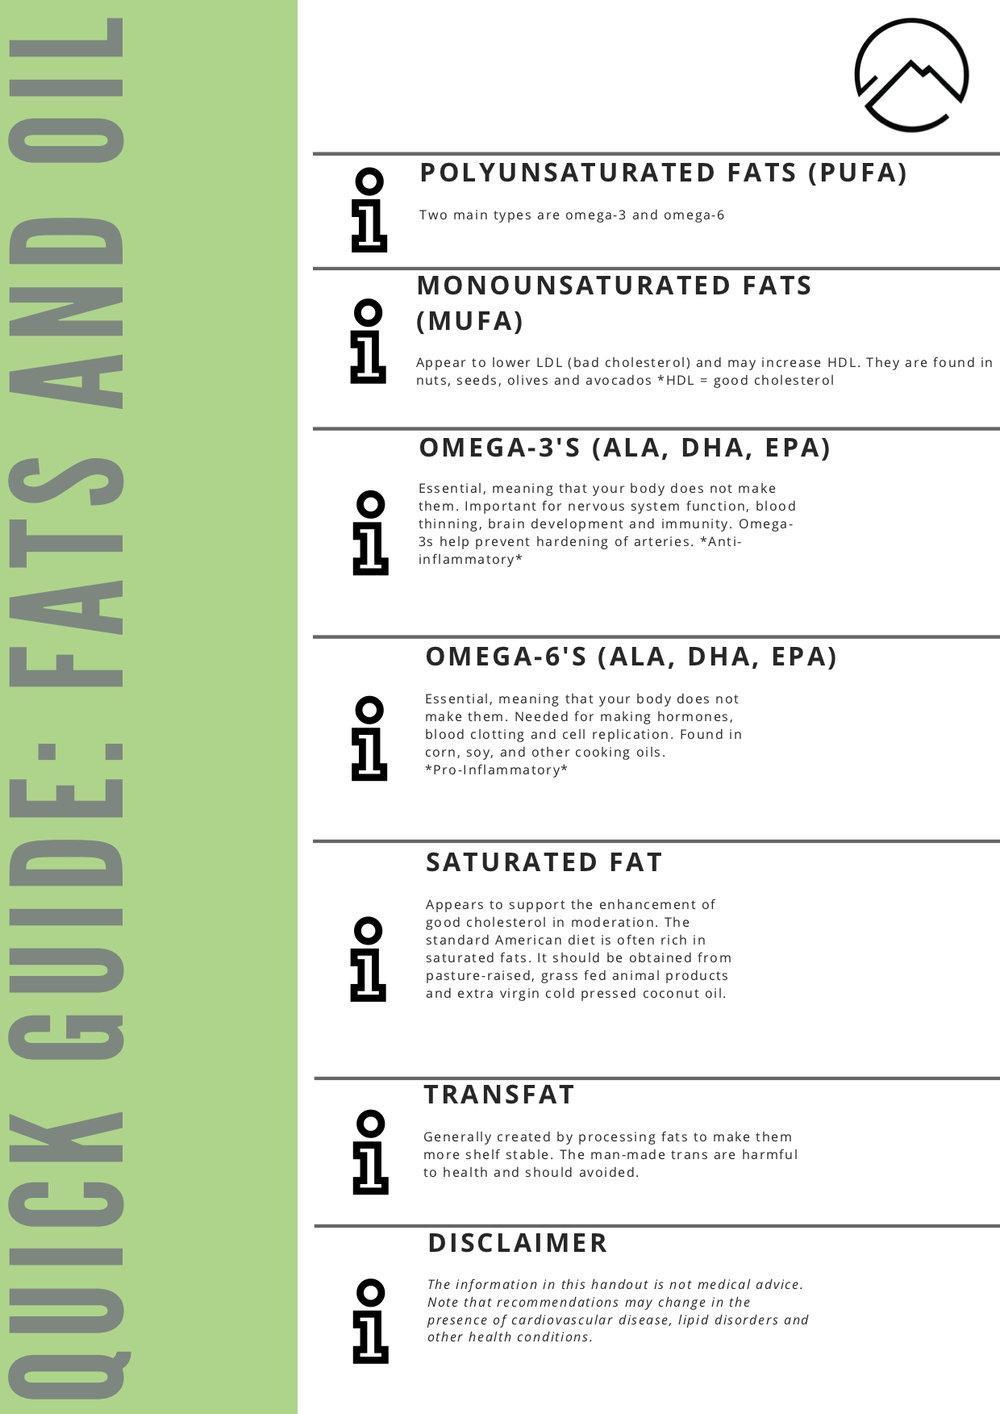 FATS infographic1.jpg